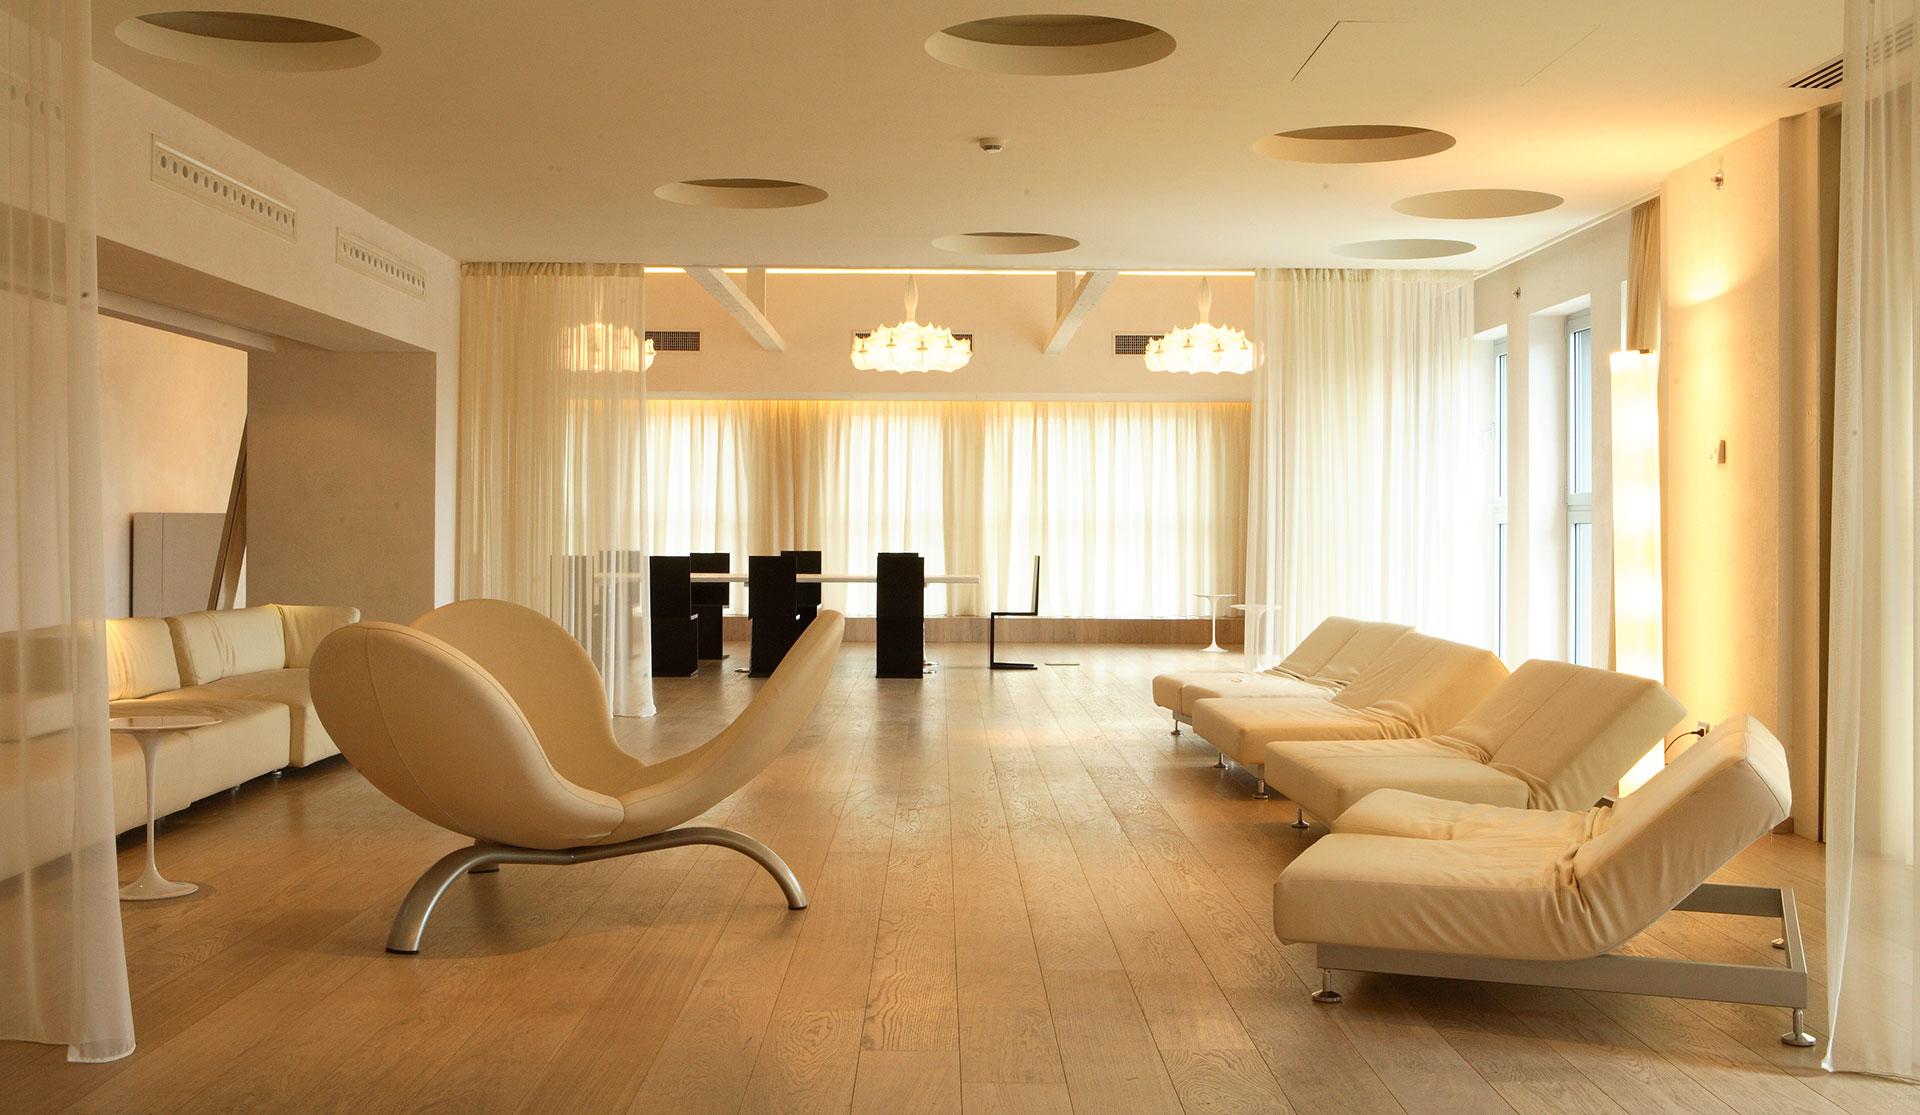 Interesting nhow hotel milan it u with interior designer - Interior designer milano ...